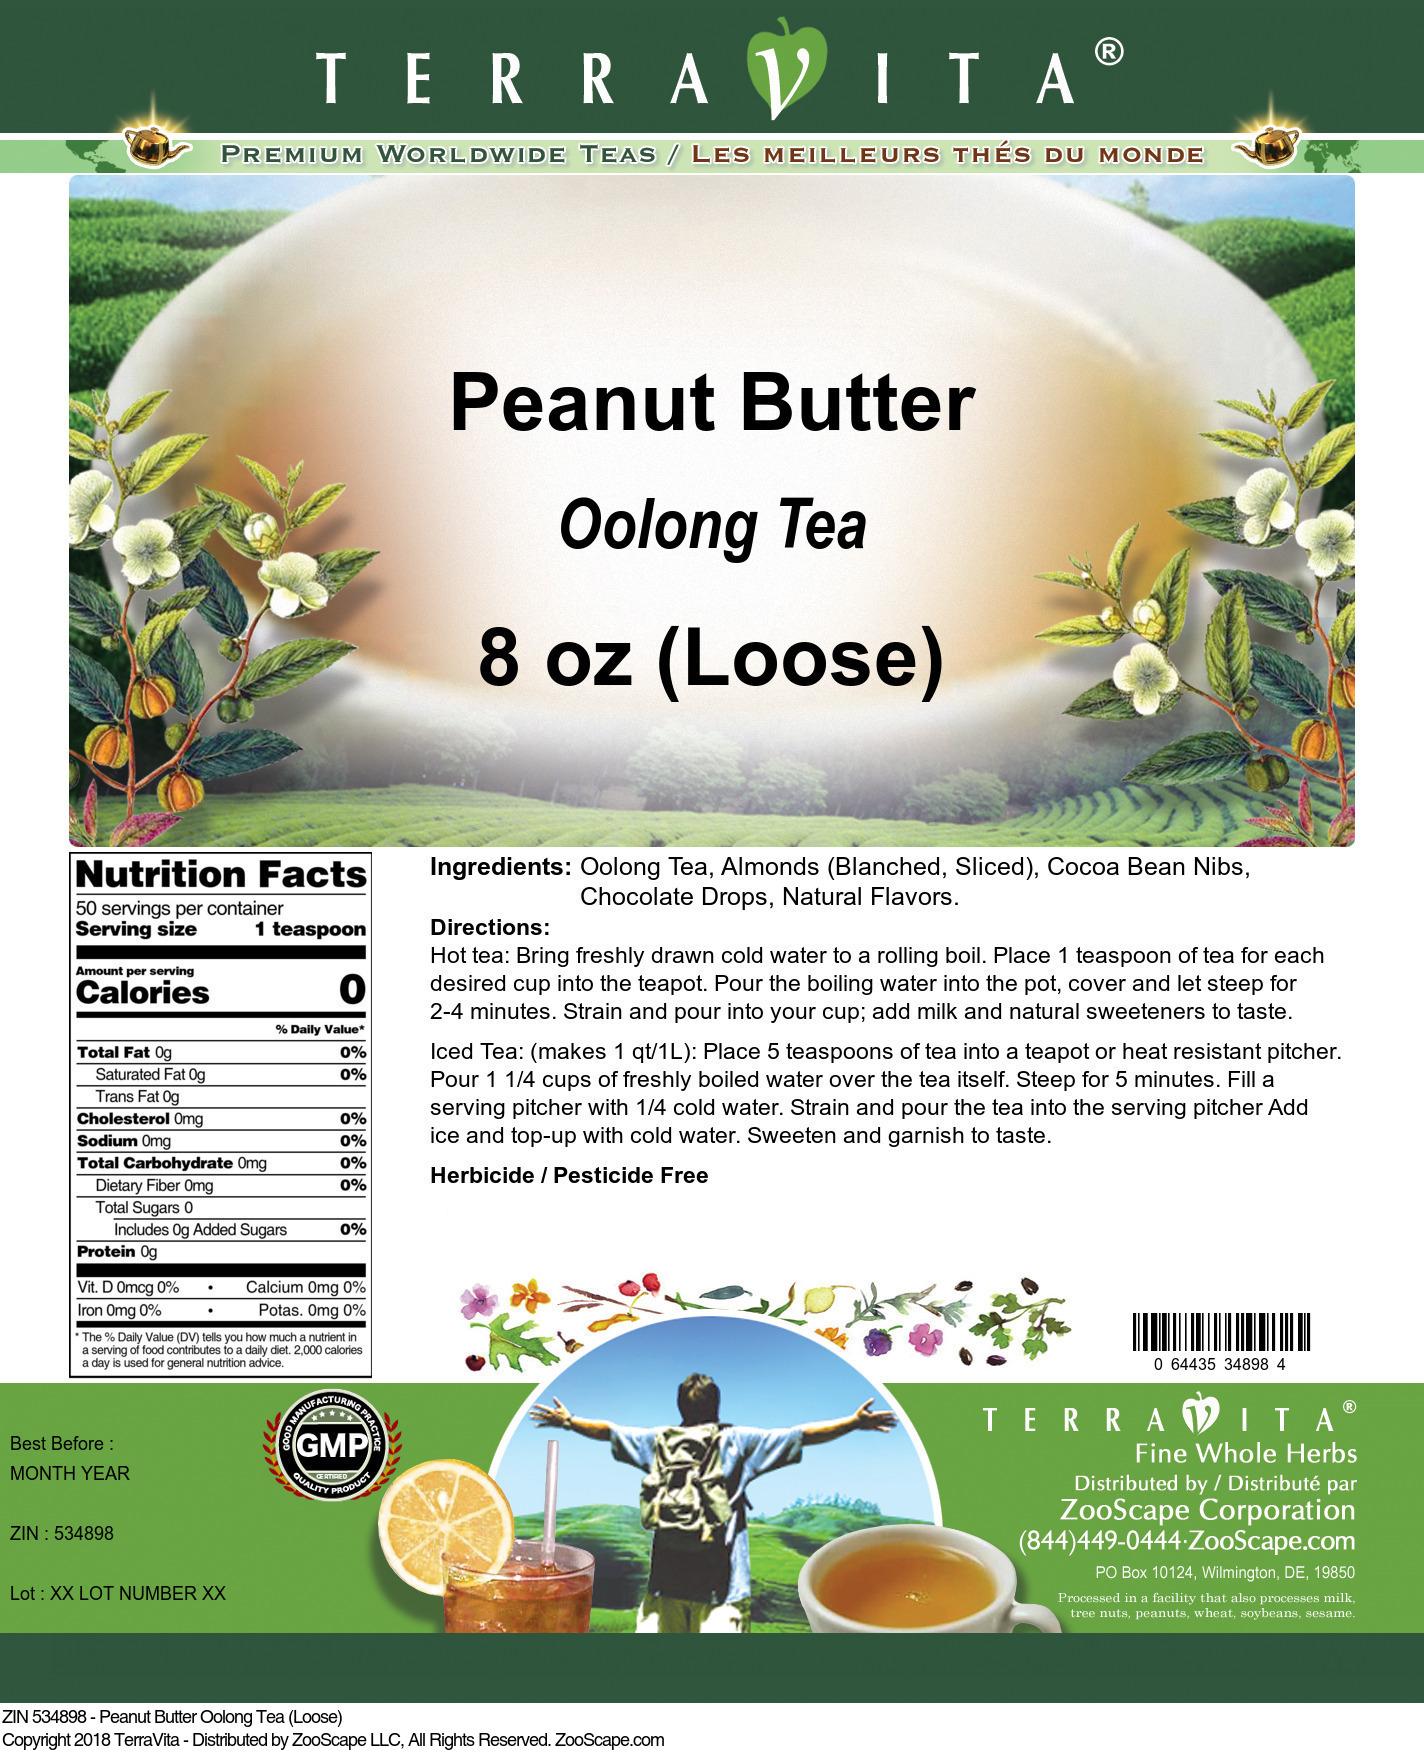 Peanut Butter Oolong Tea (Loose)